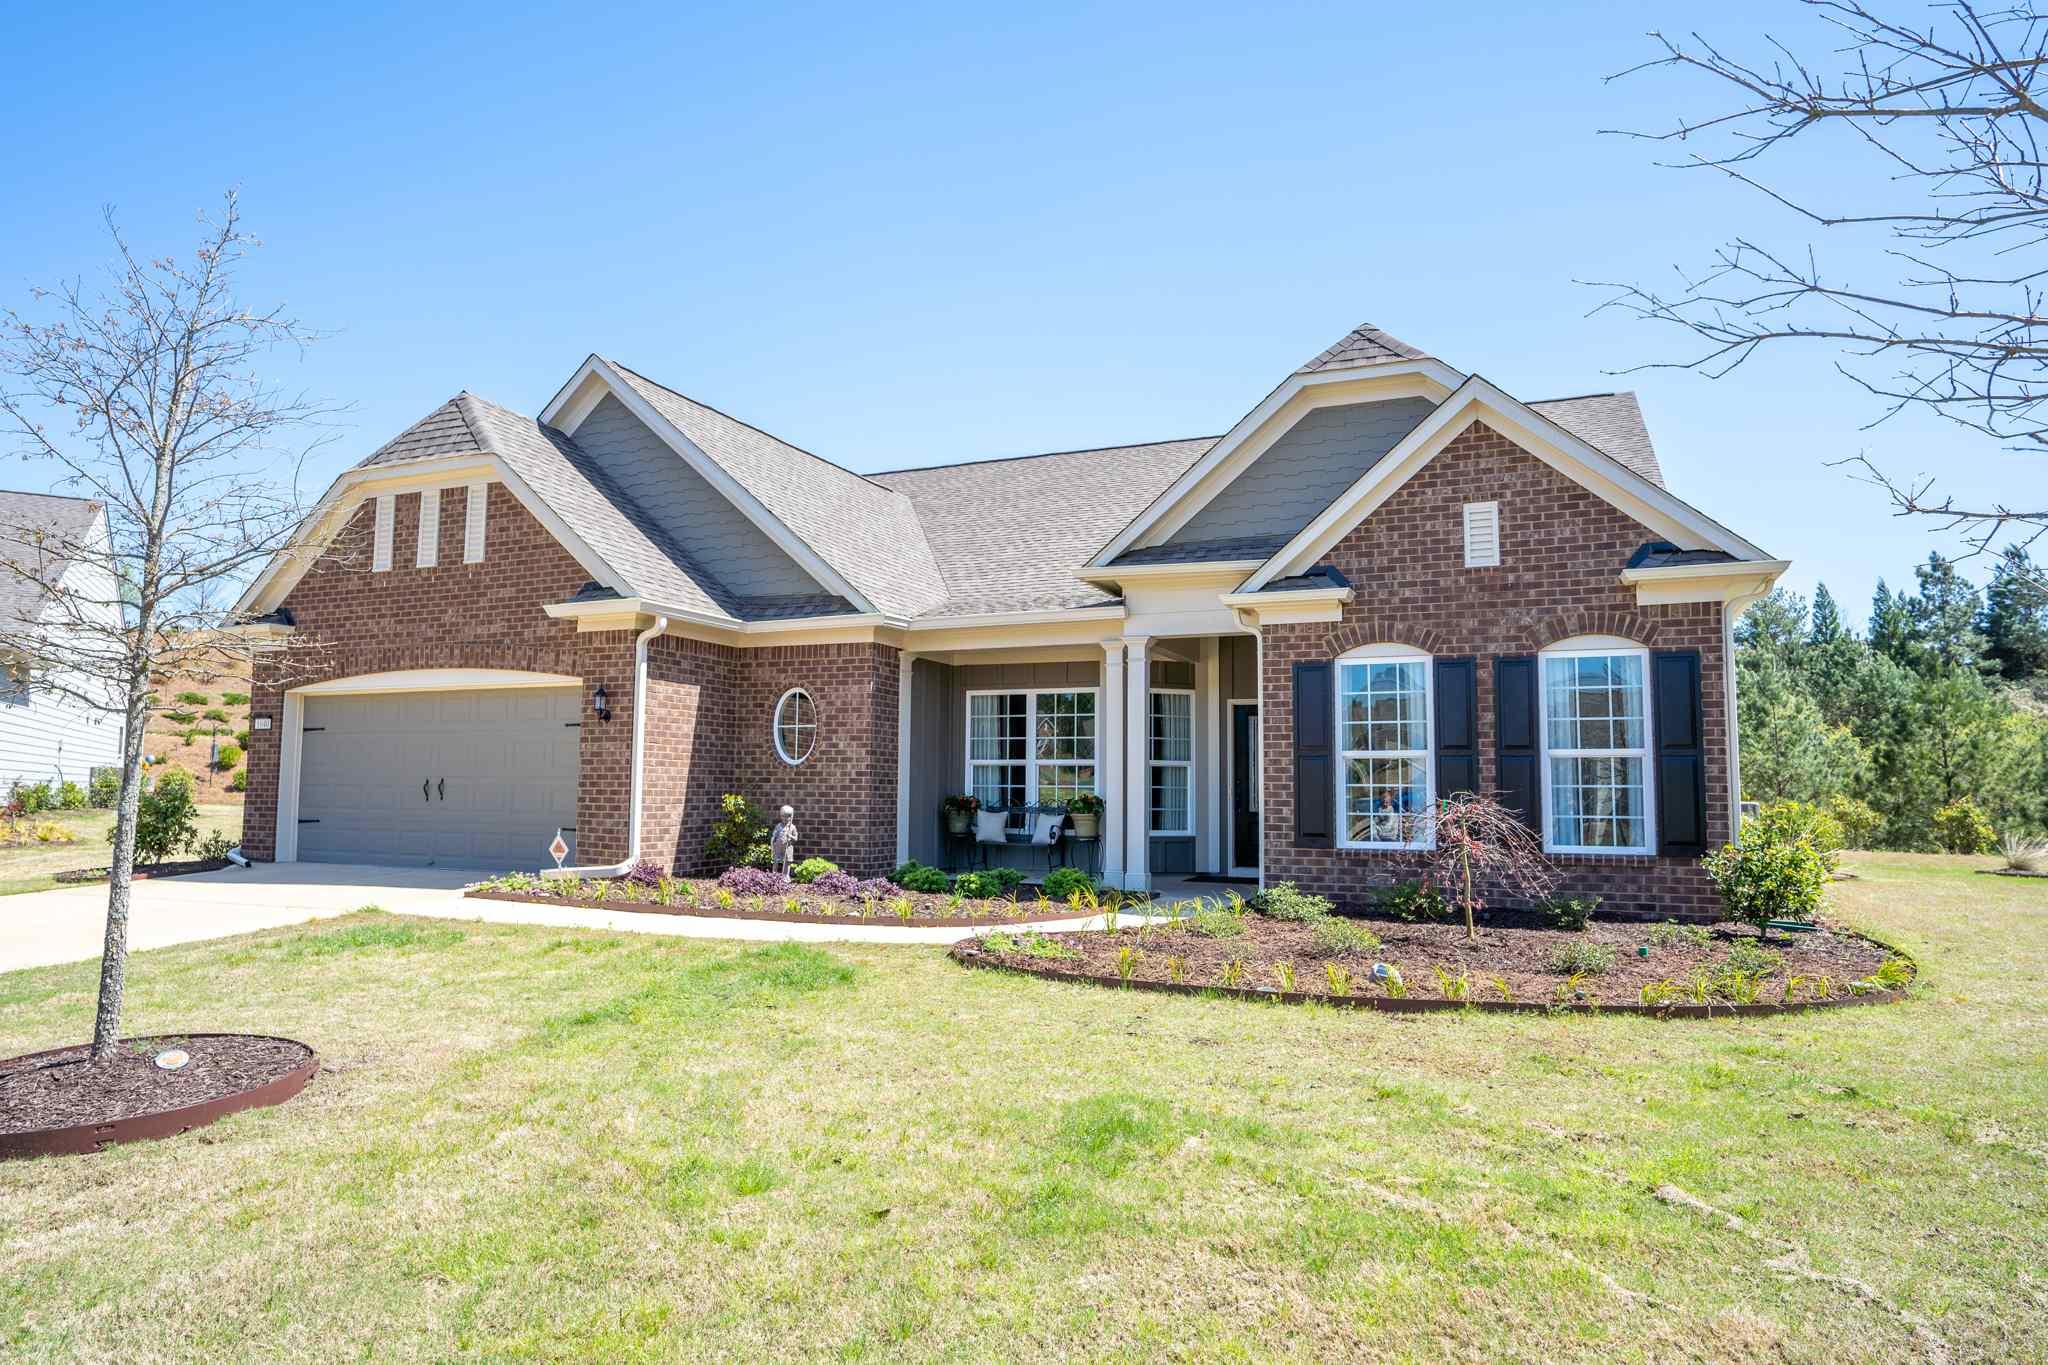 Property for sale at 1040 DUCK COVE WAY, Greensboro,  Georgia 30642